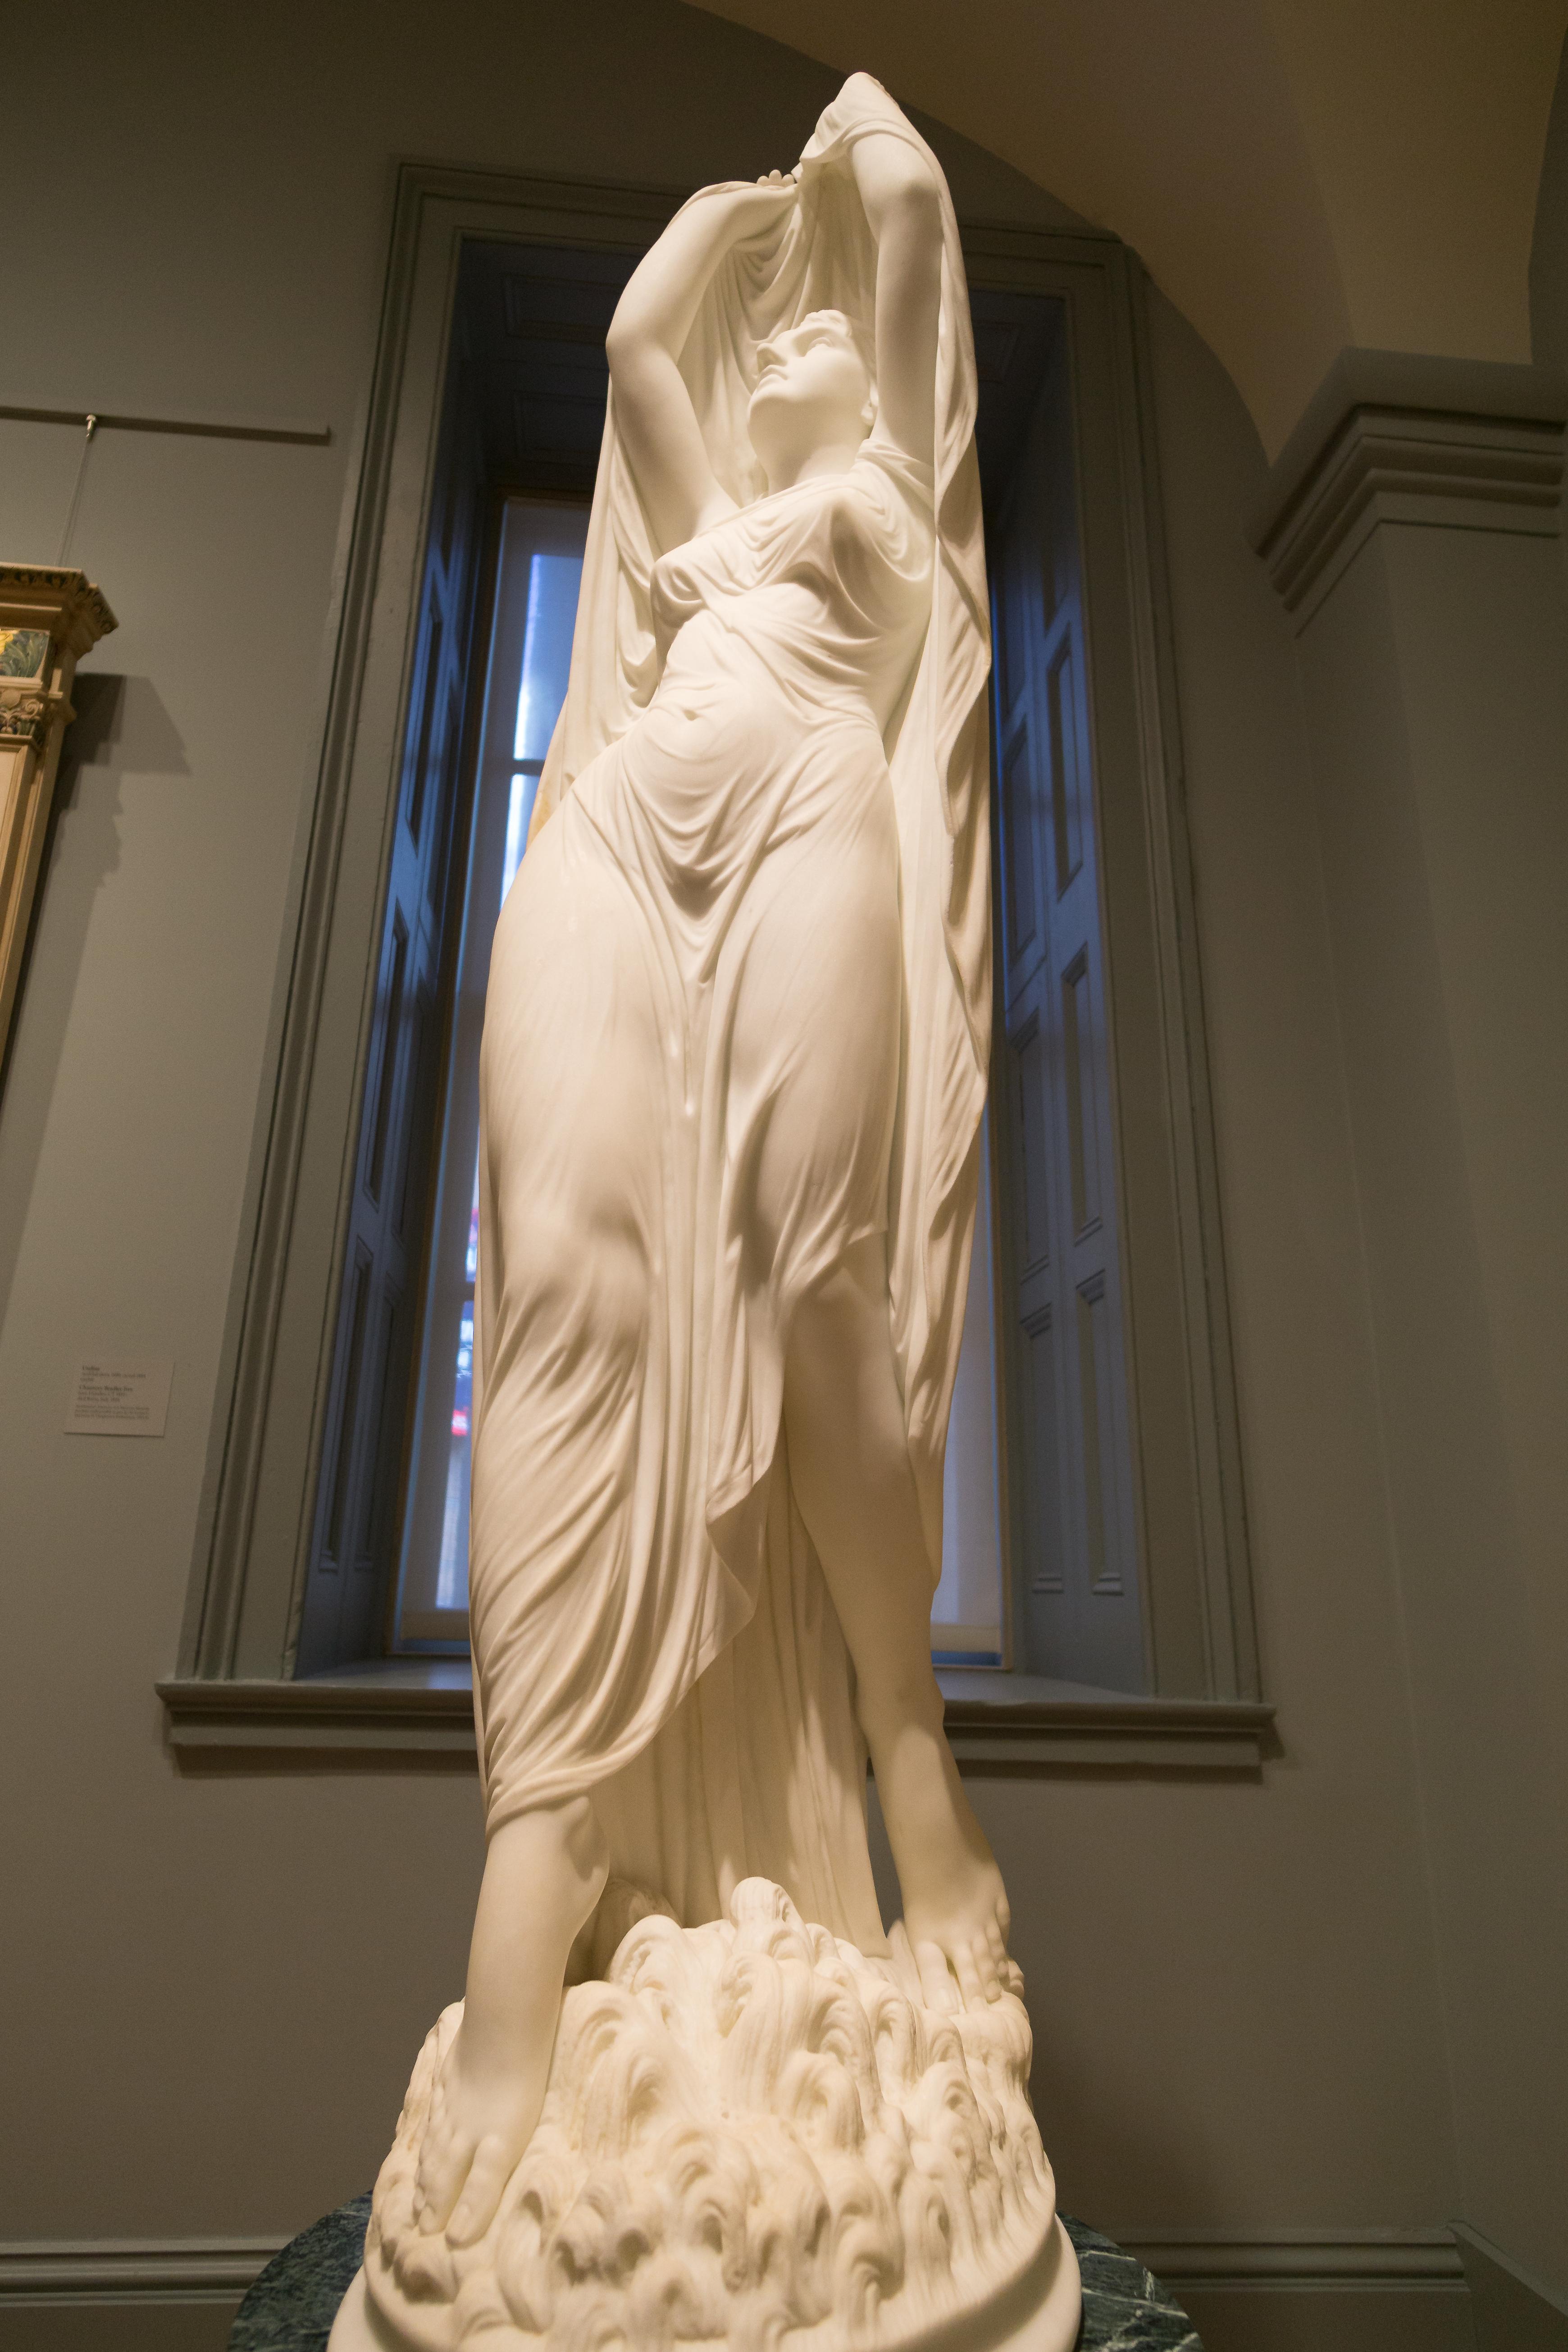 File:Smithsonian-Ives-Undine-2181.jpg